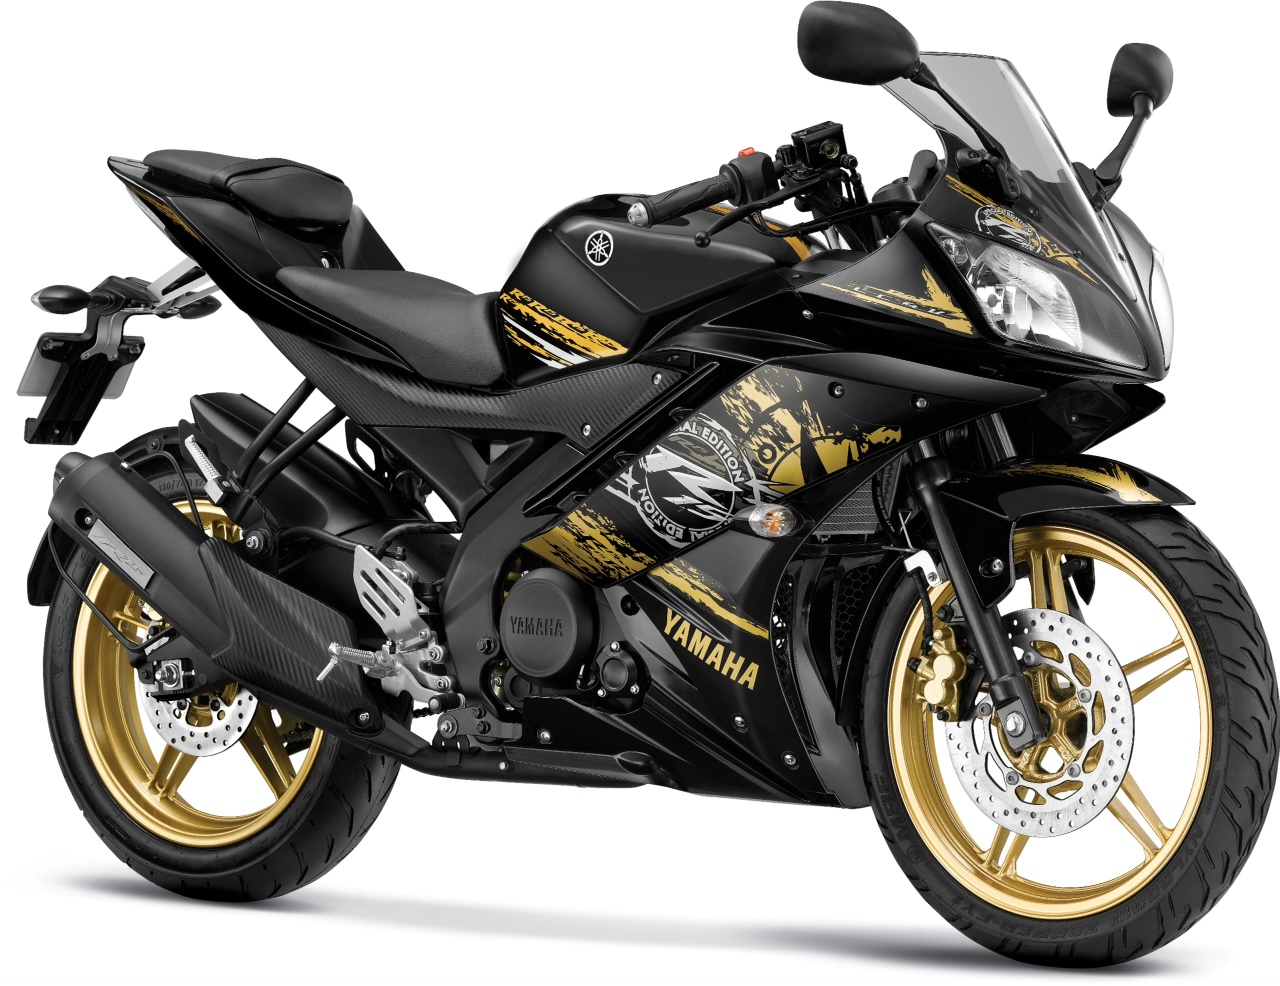 Yamaha R15 gets new colours   Bike News   Bikes 135cc ... Yamaha New Bike 2014 R15